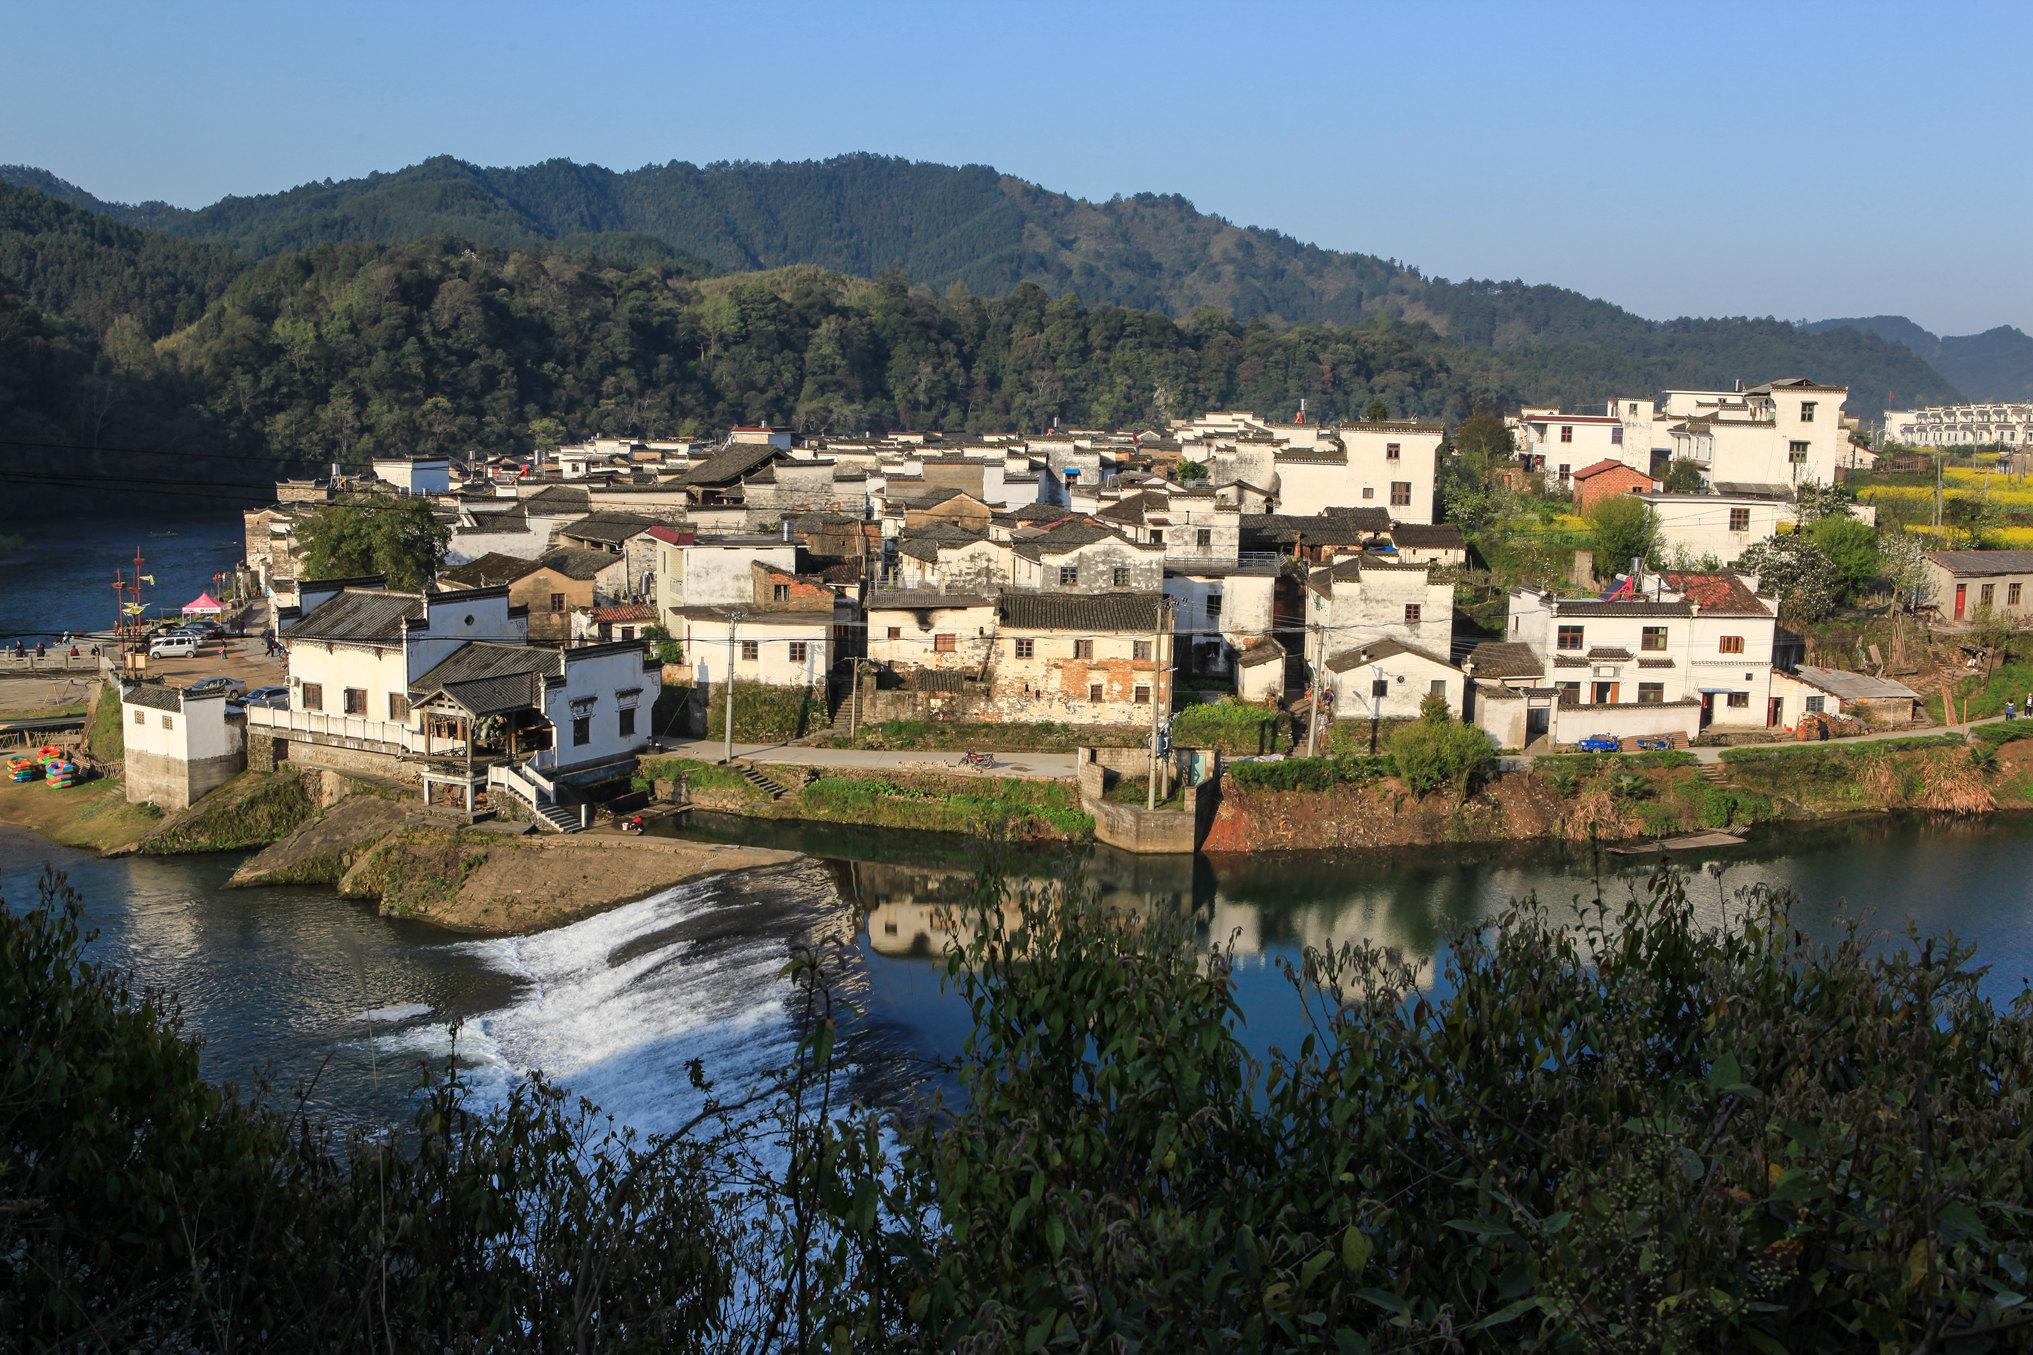 Wangkou Village